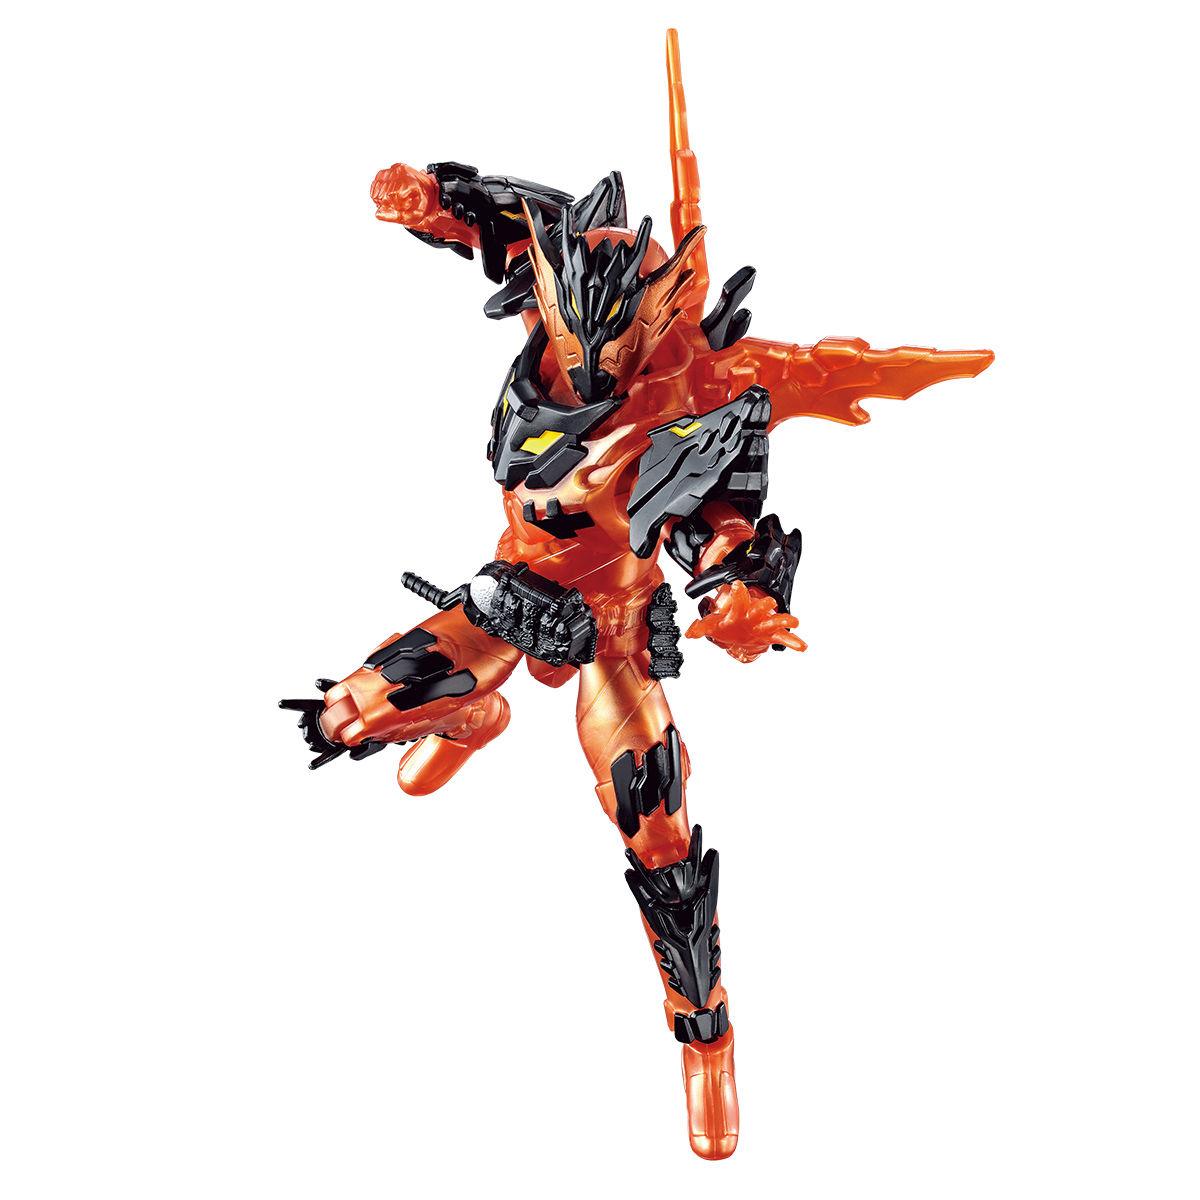 RKFレジェンドライダーシリーズ『仮面ライダークローズマグマ』可動フィギュア-002